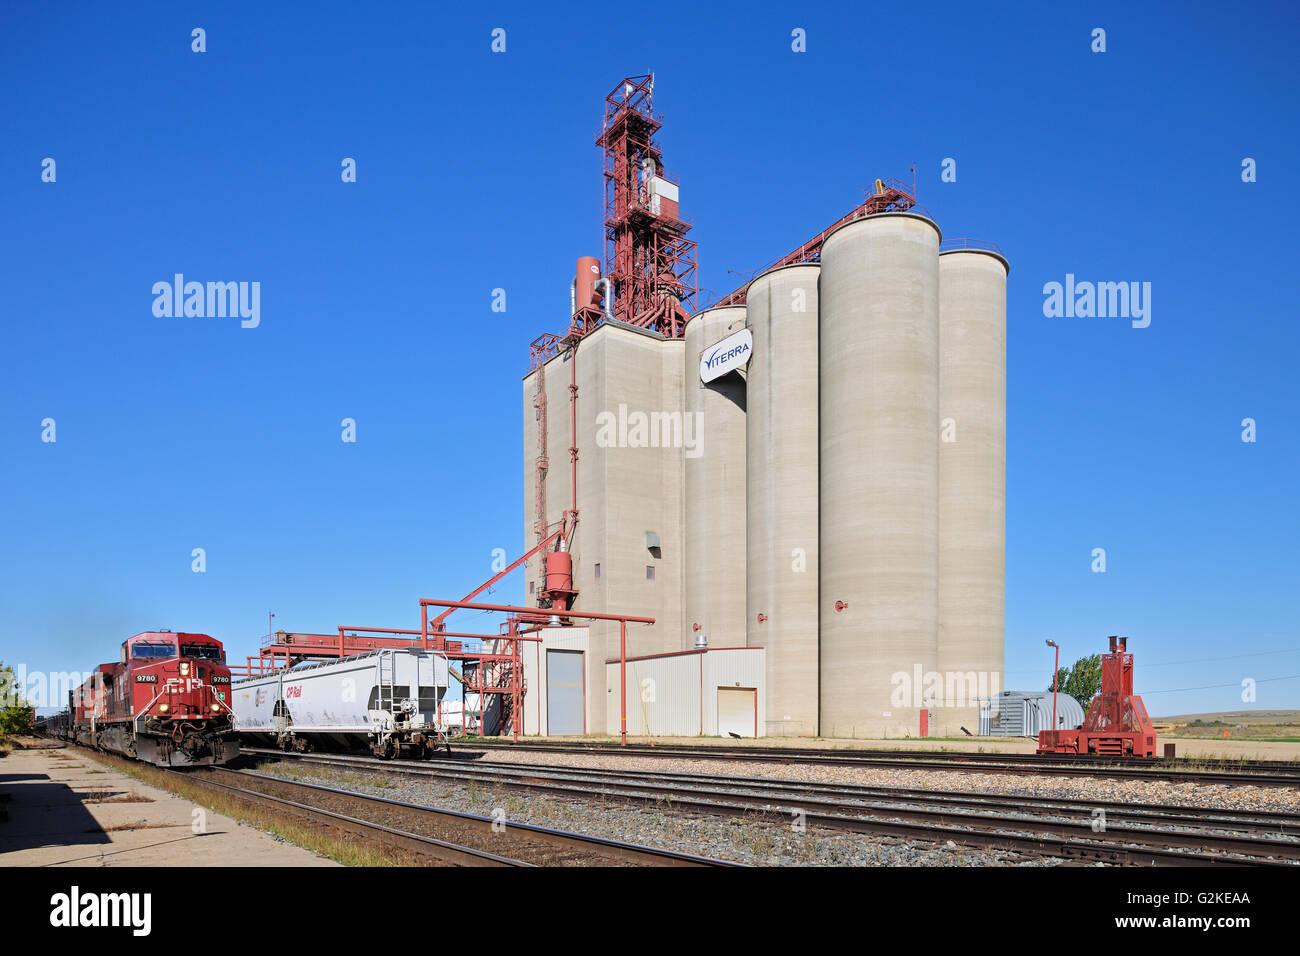 Inland grain terminal and train with railway tracks Maple Creek Saskatchewan Canada - Stock Image